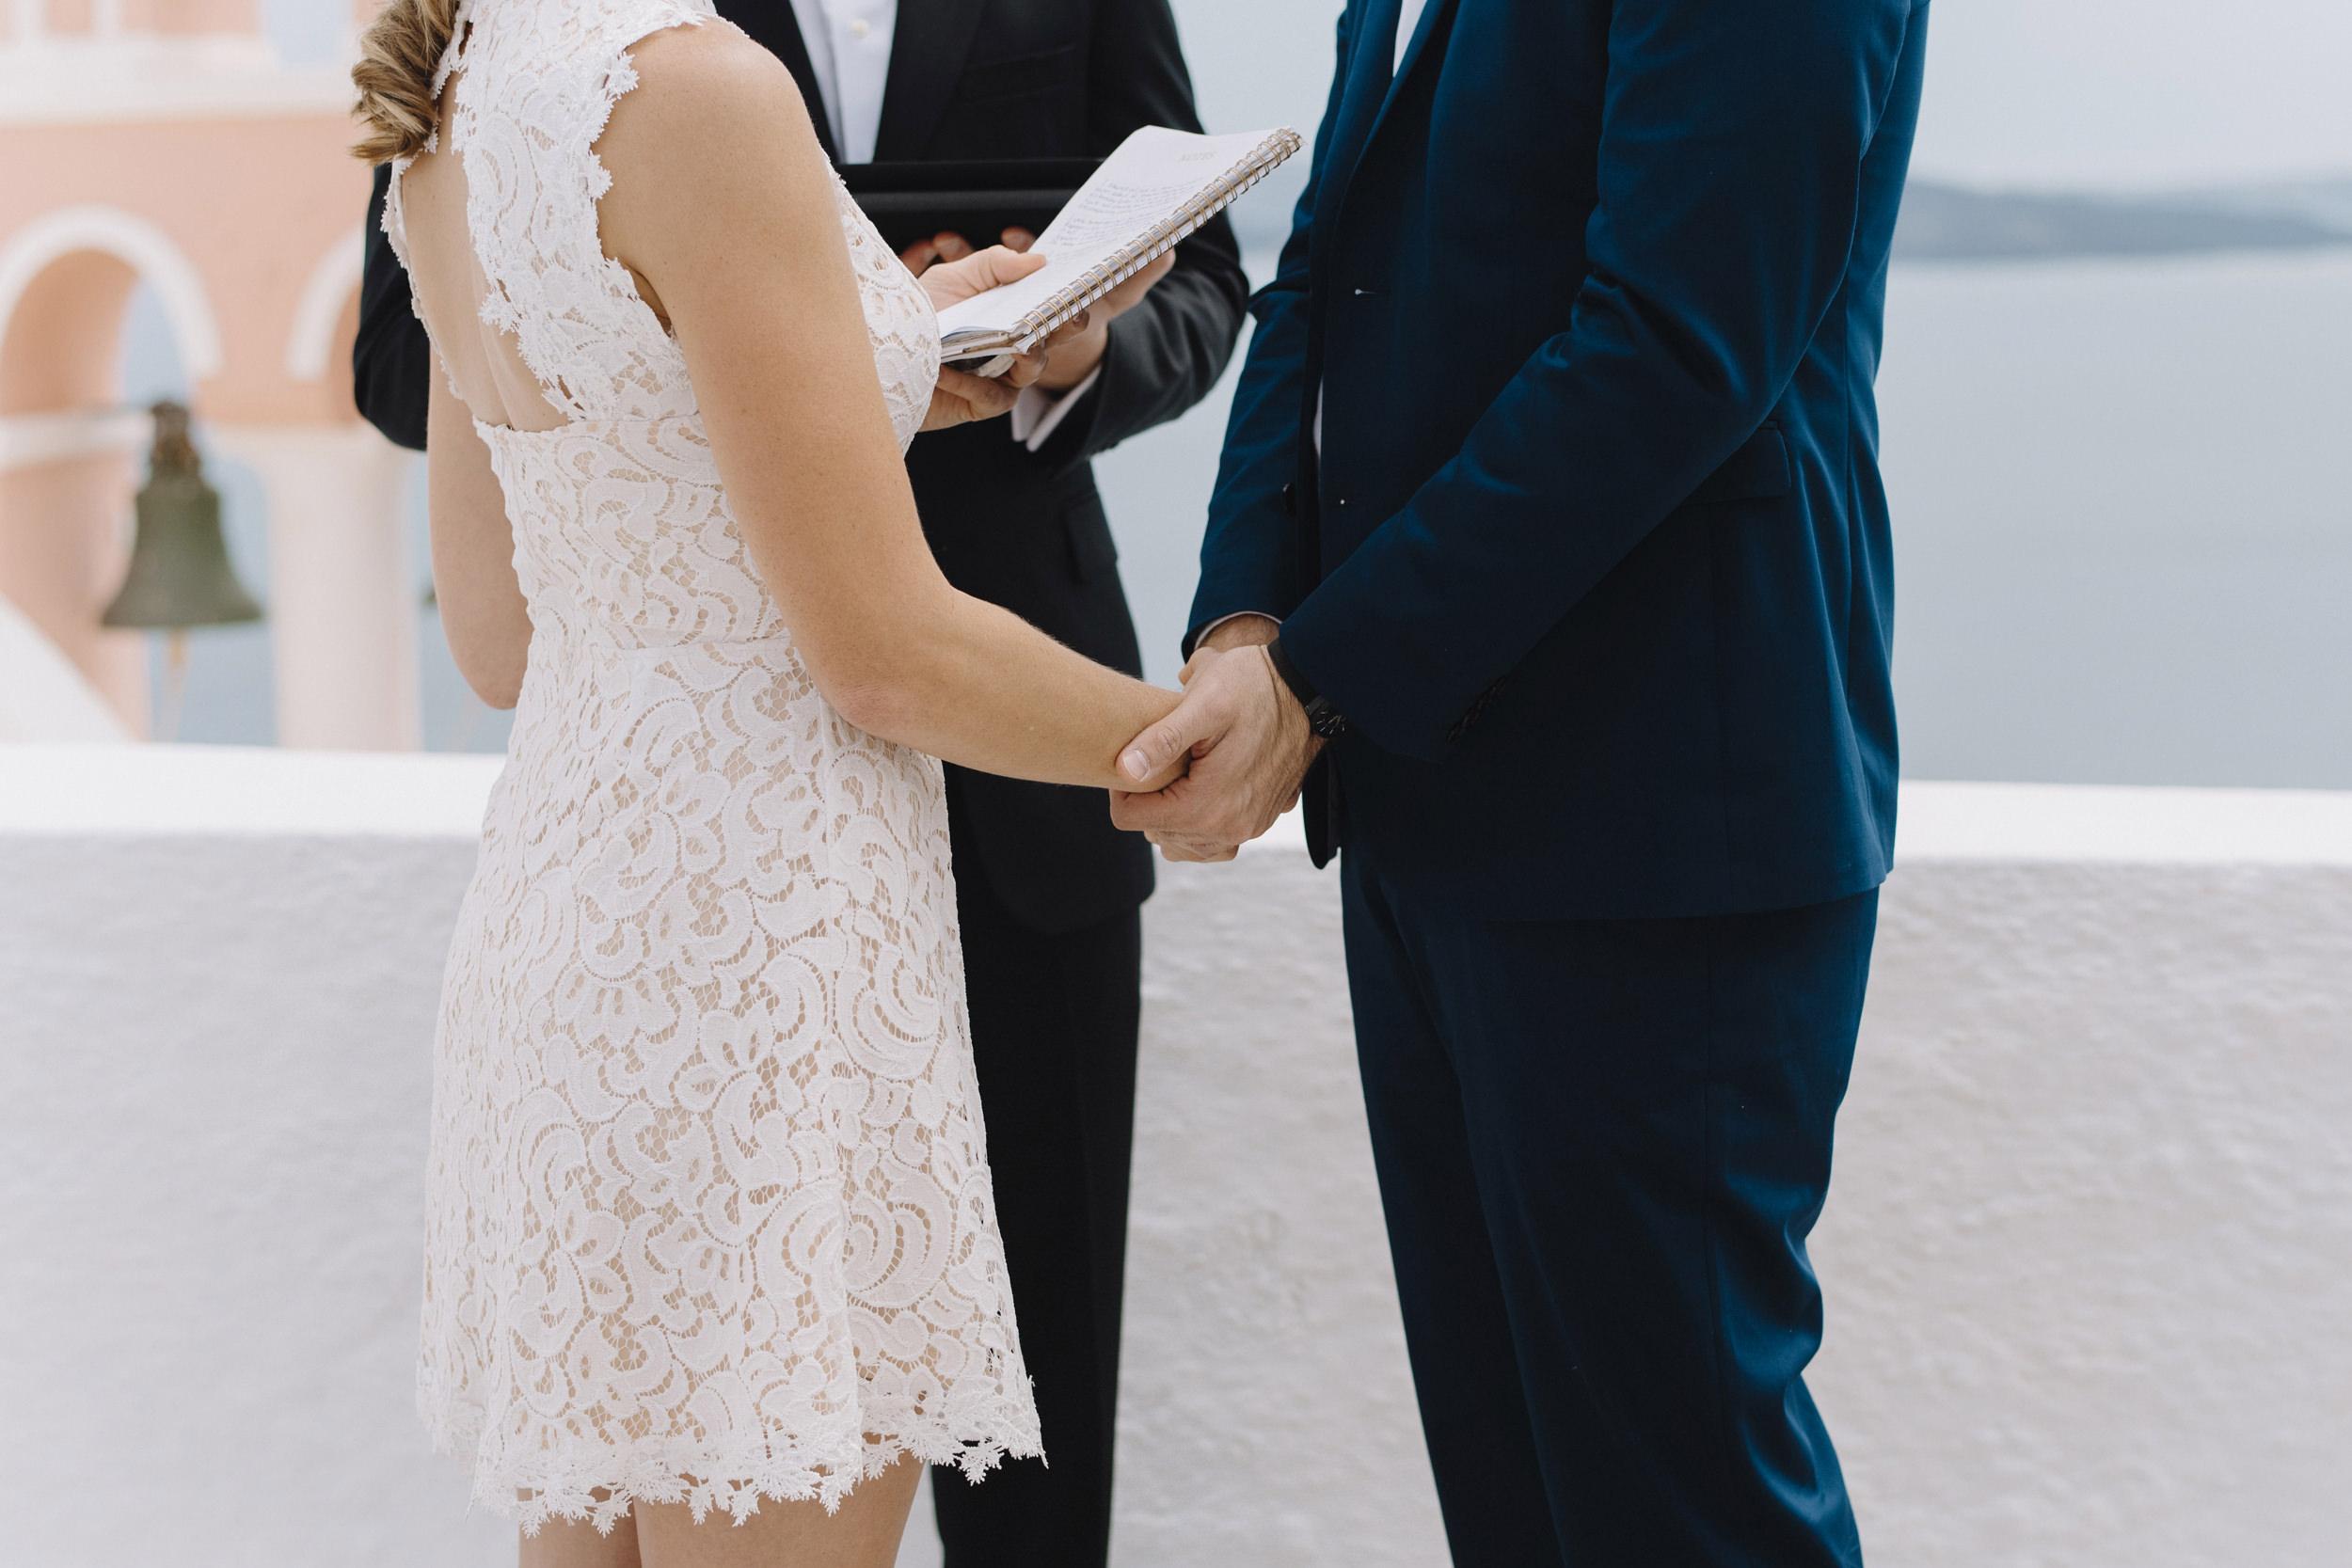 Oia Santorini Greece Destination Elopement Wedding Photographer Colby and Jess